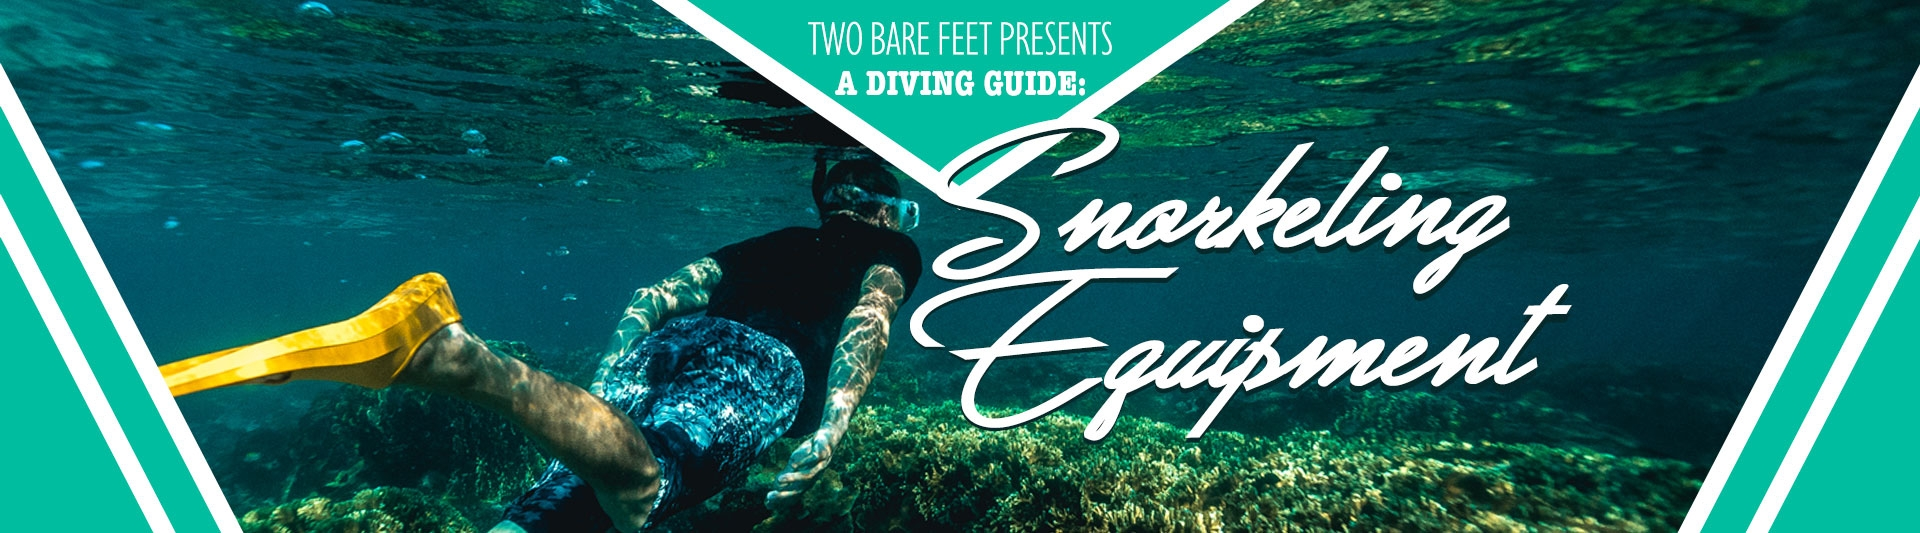 snorkelling equipment banner